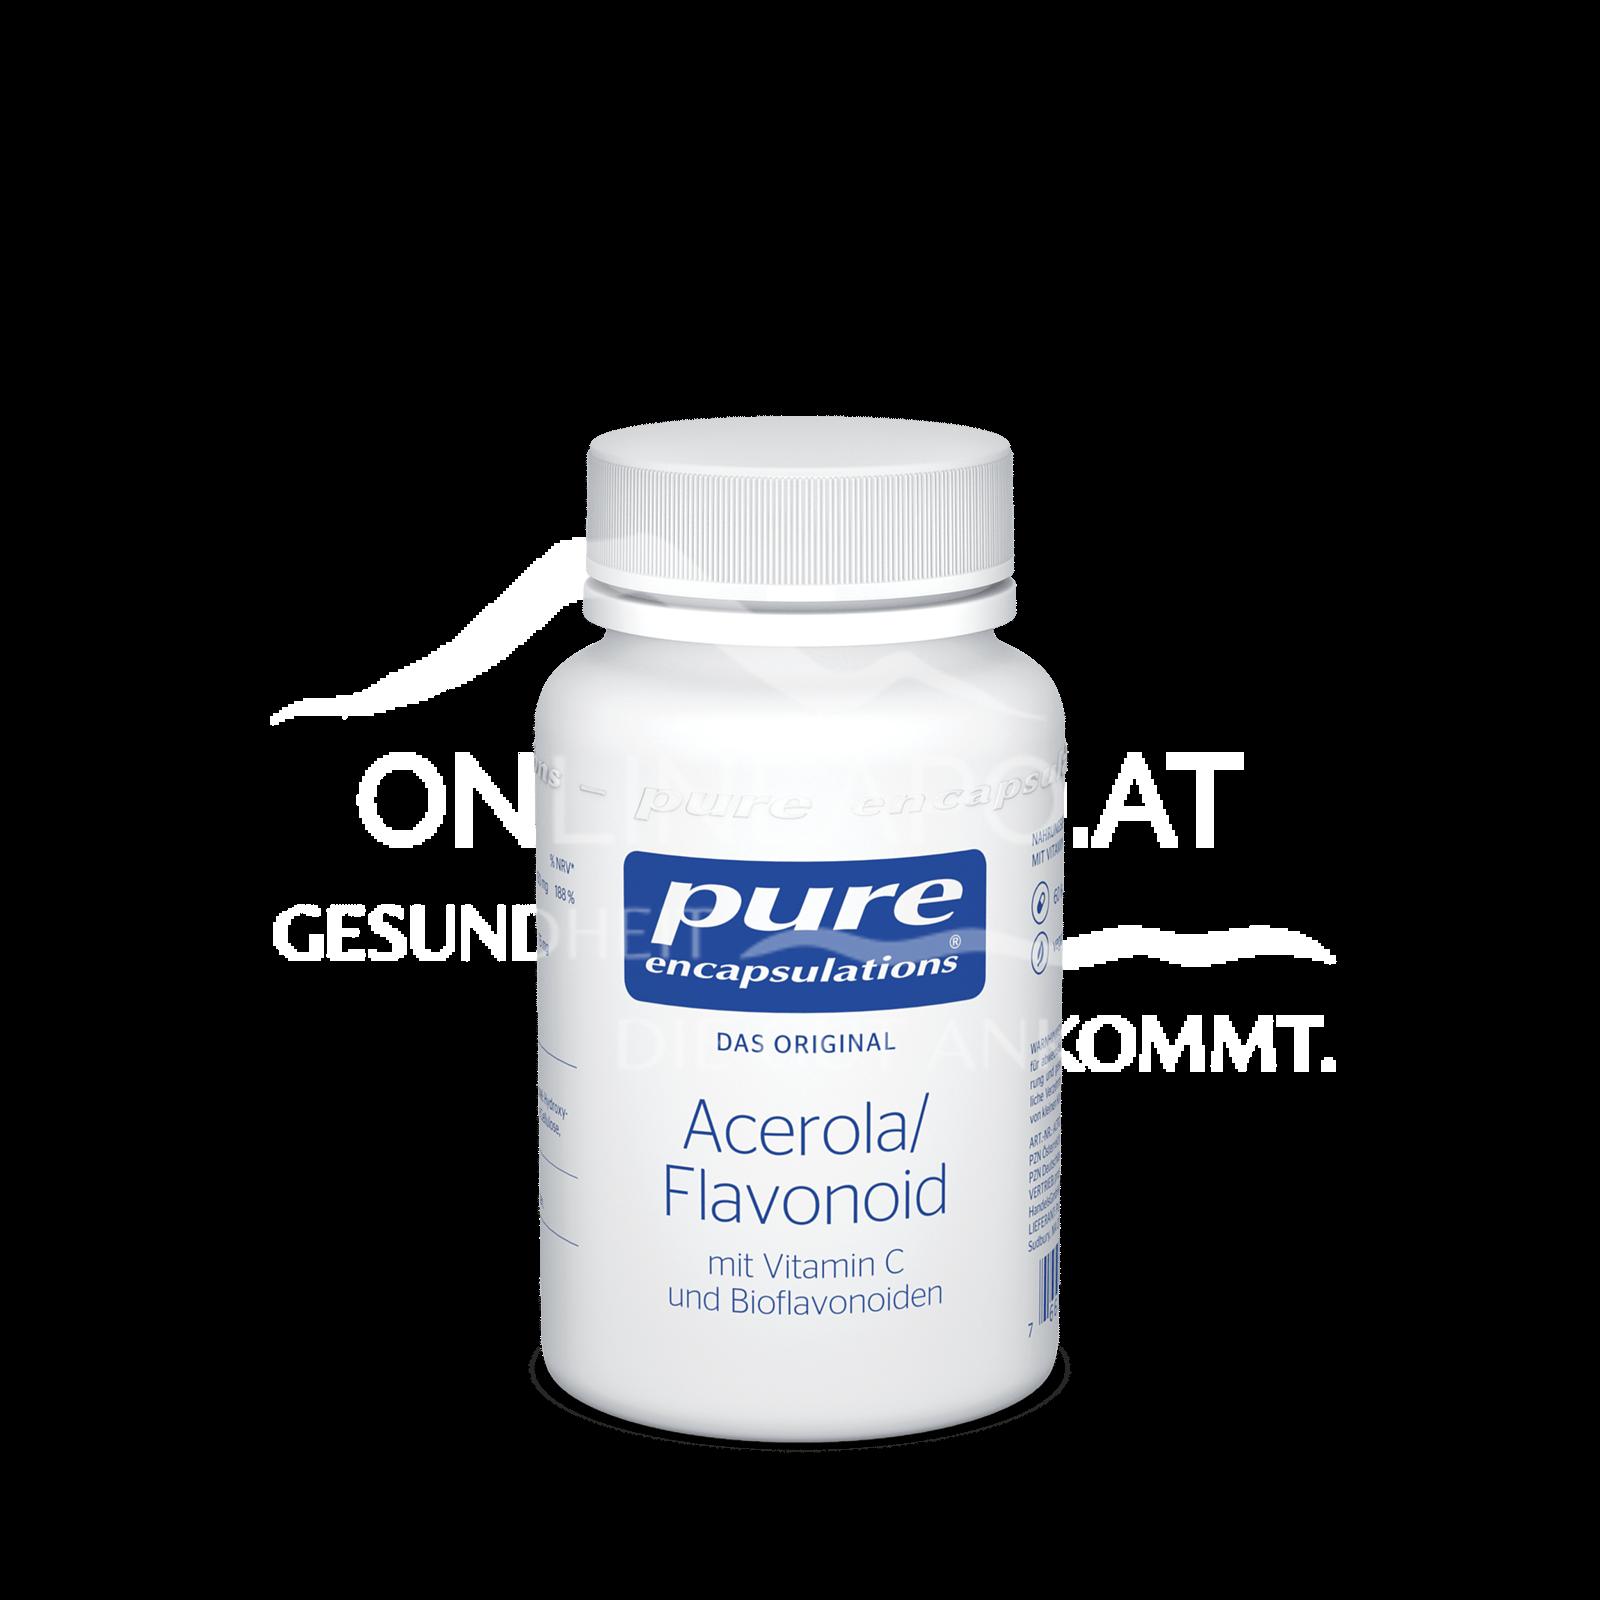 pure encapsulations® Acerola/Flavonoid